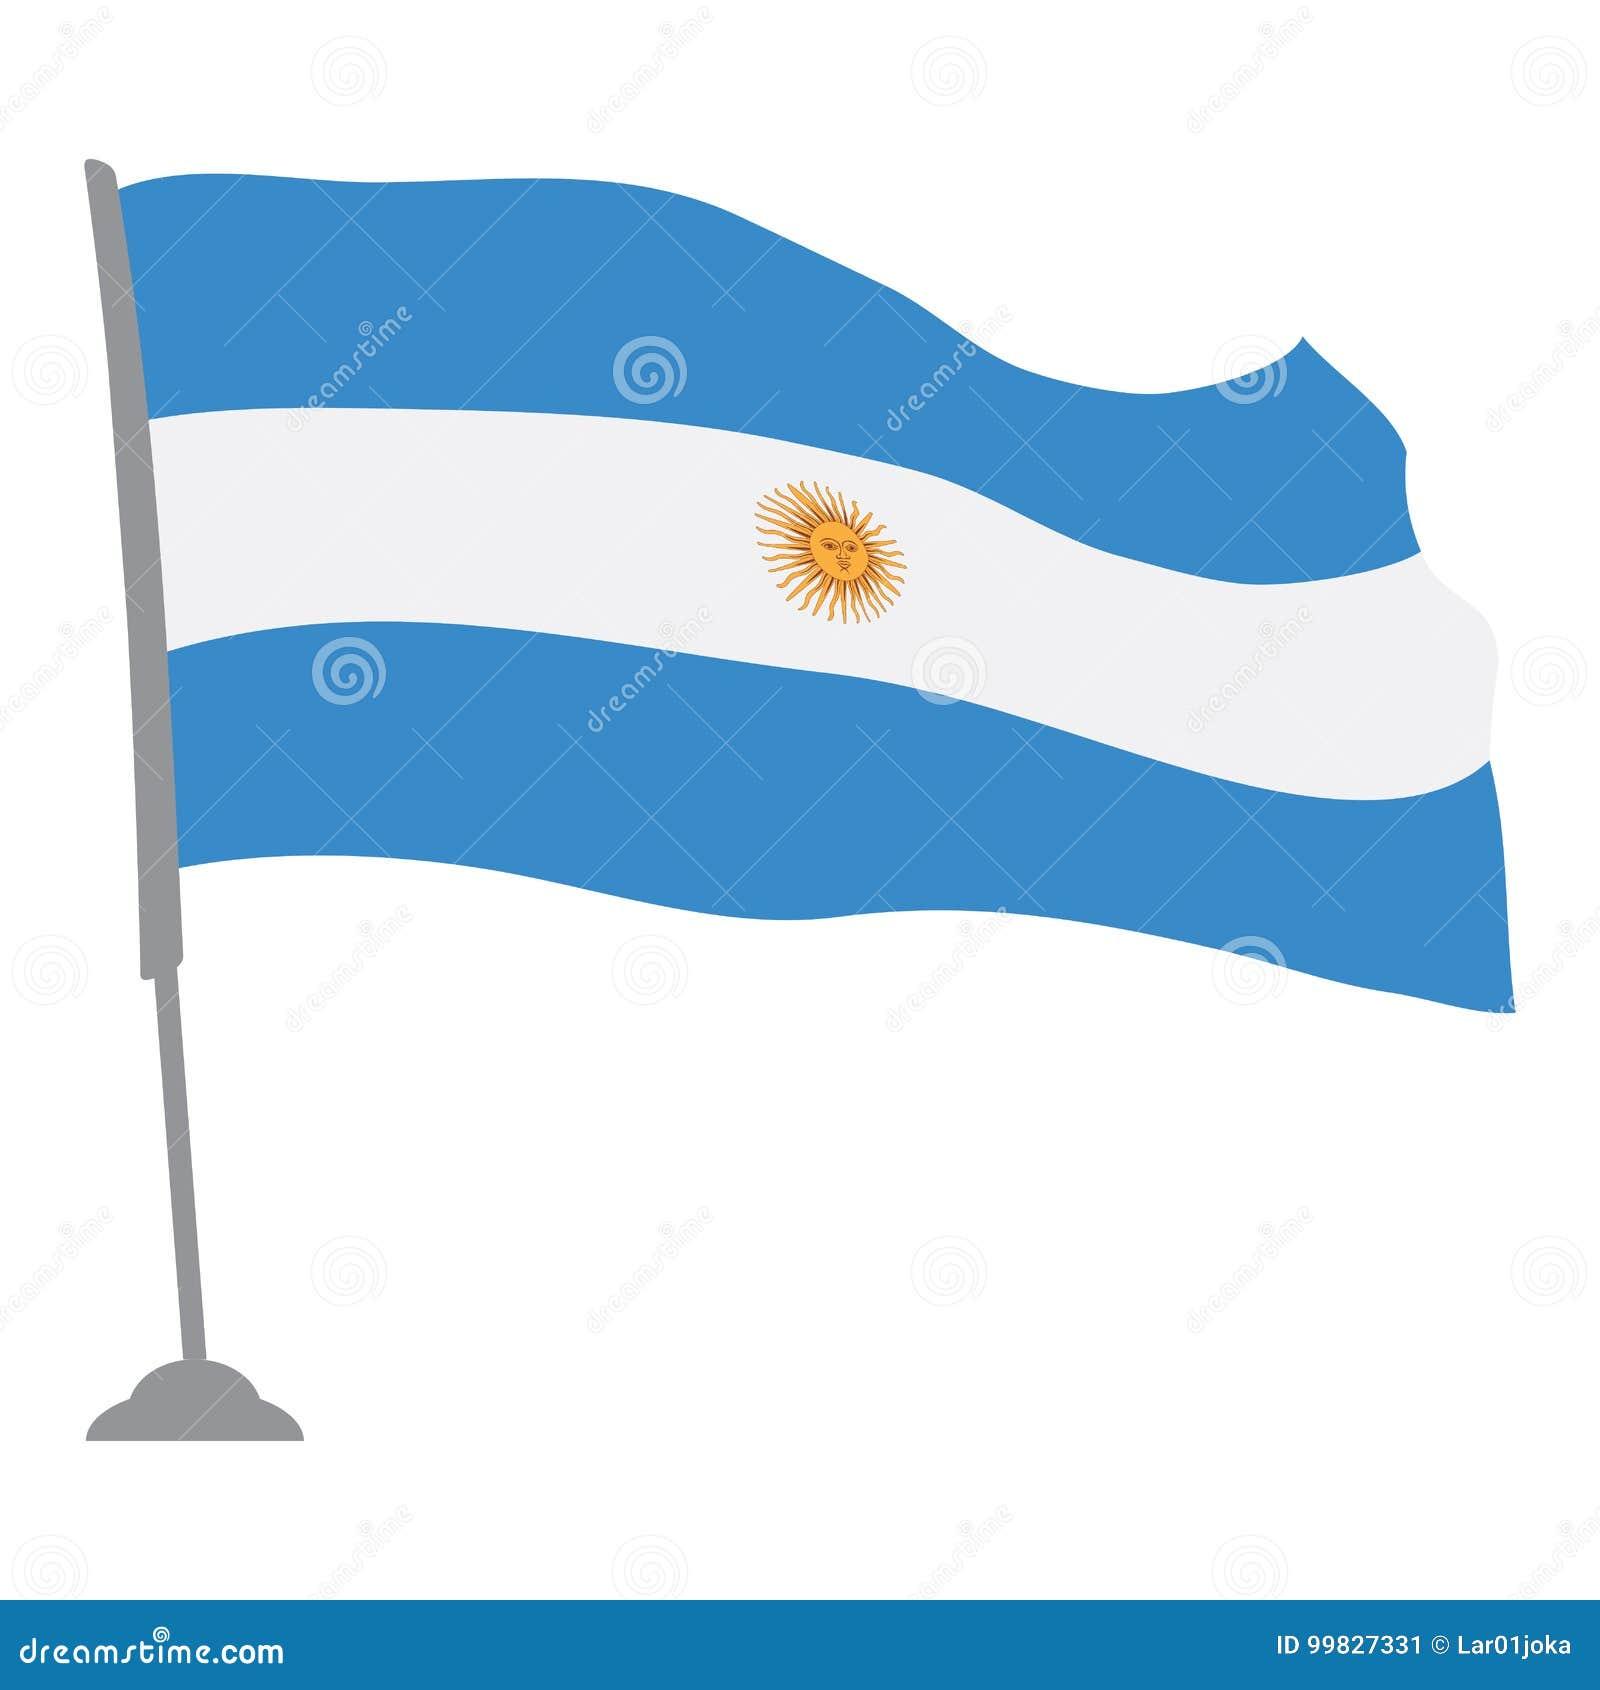 Argentina flagę